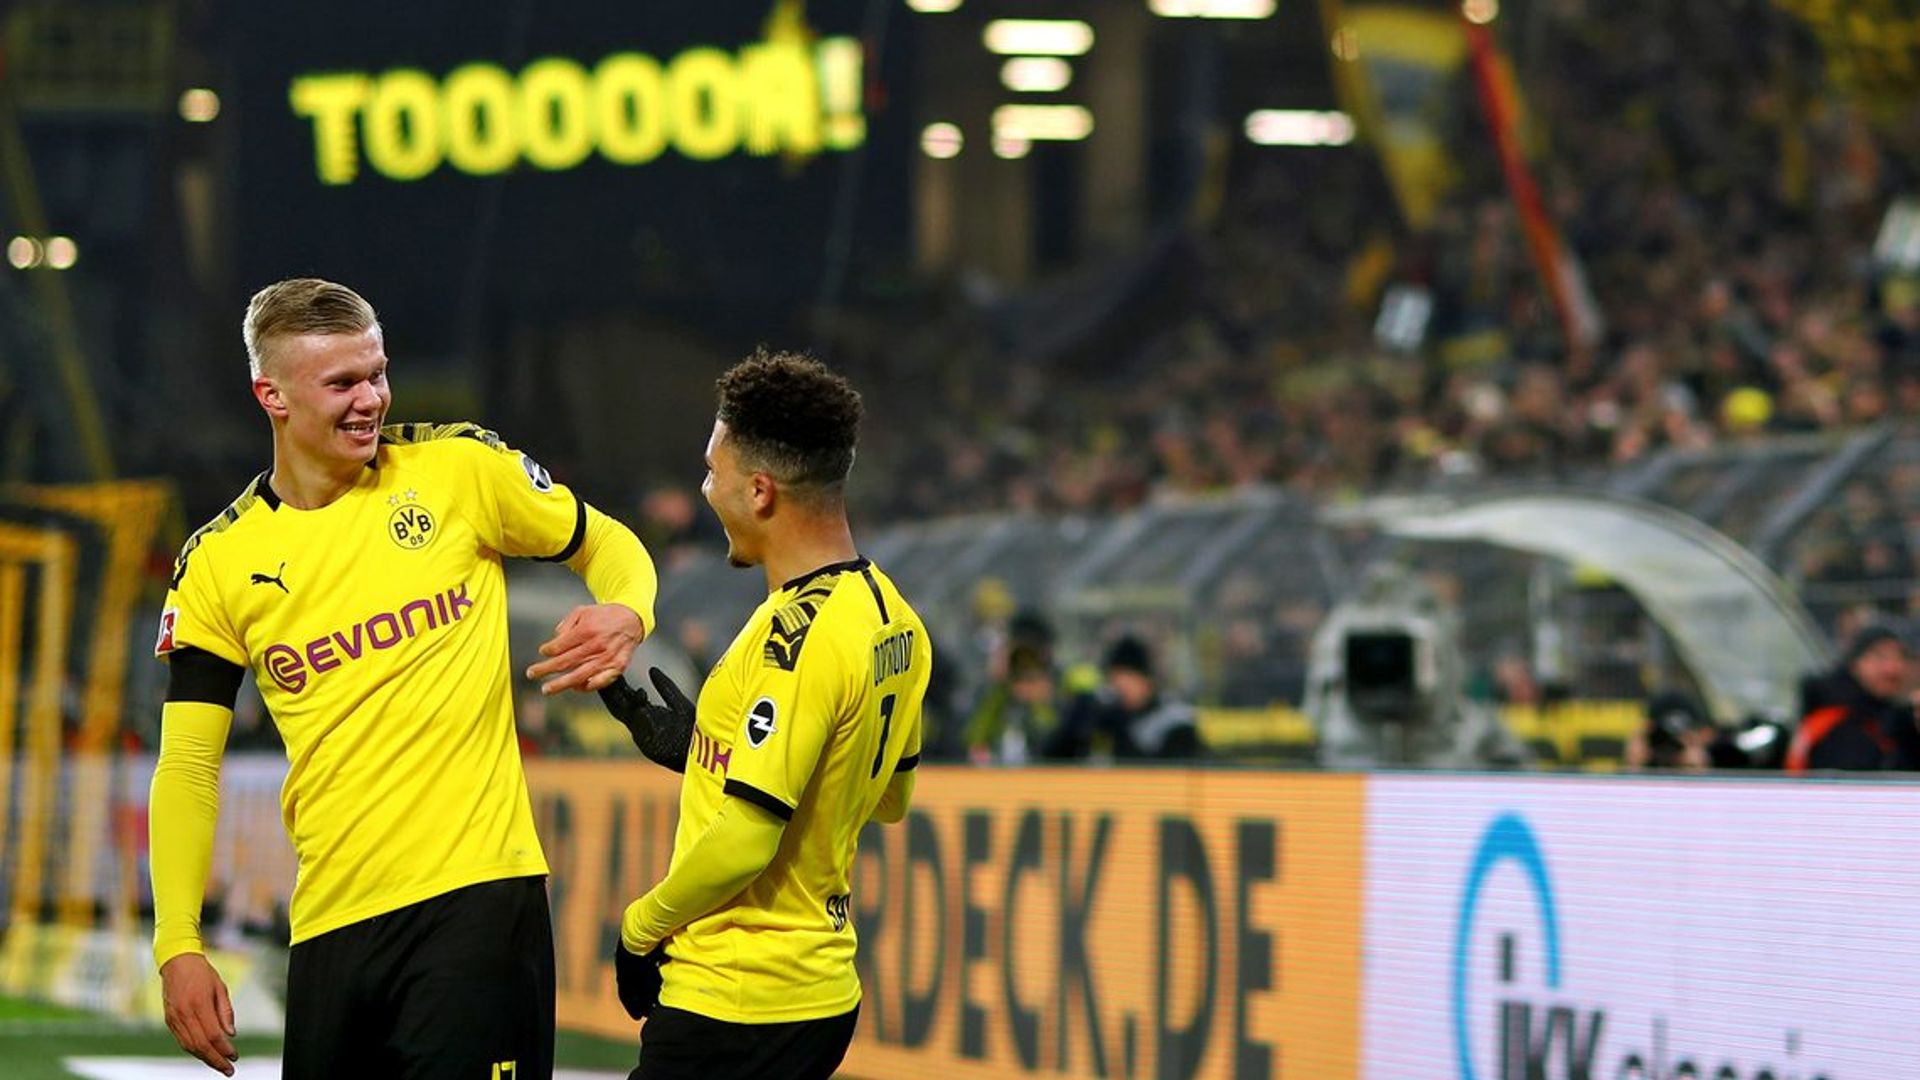 Bundesliga | Sancho + Haaland: ¡pareja explosiva en el BVB!